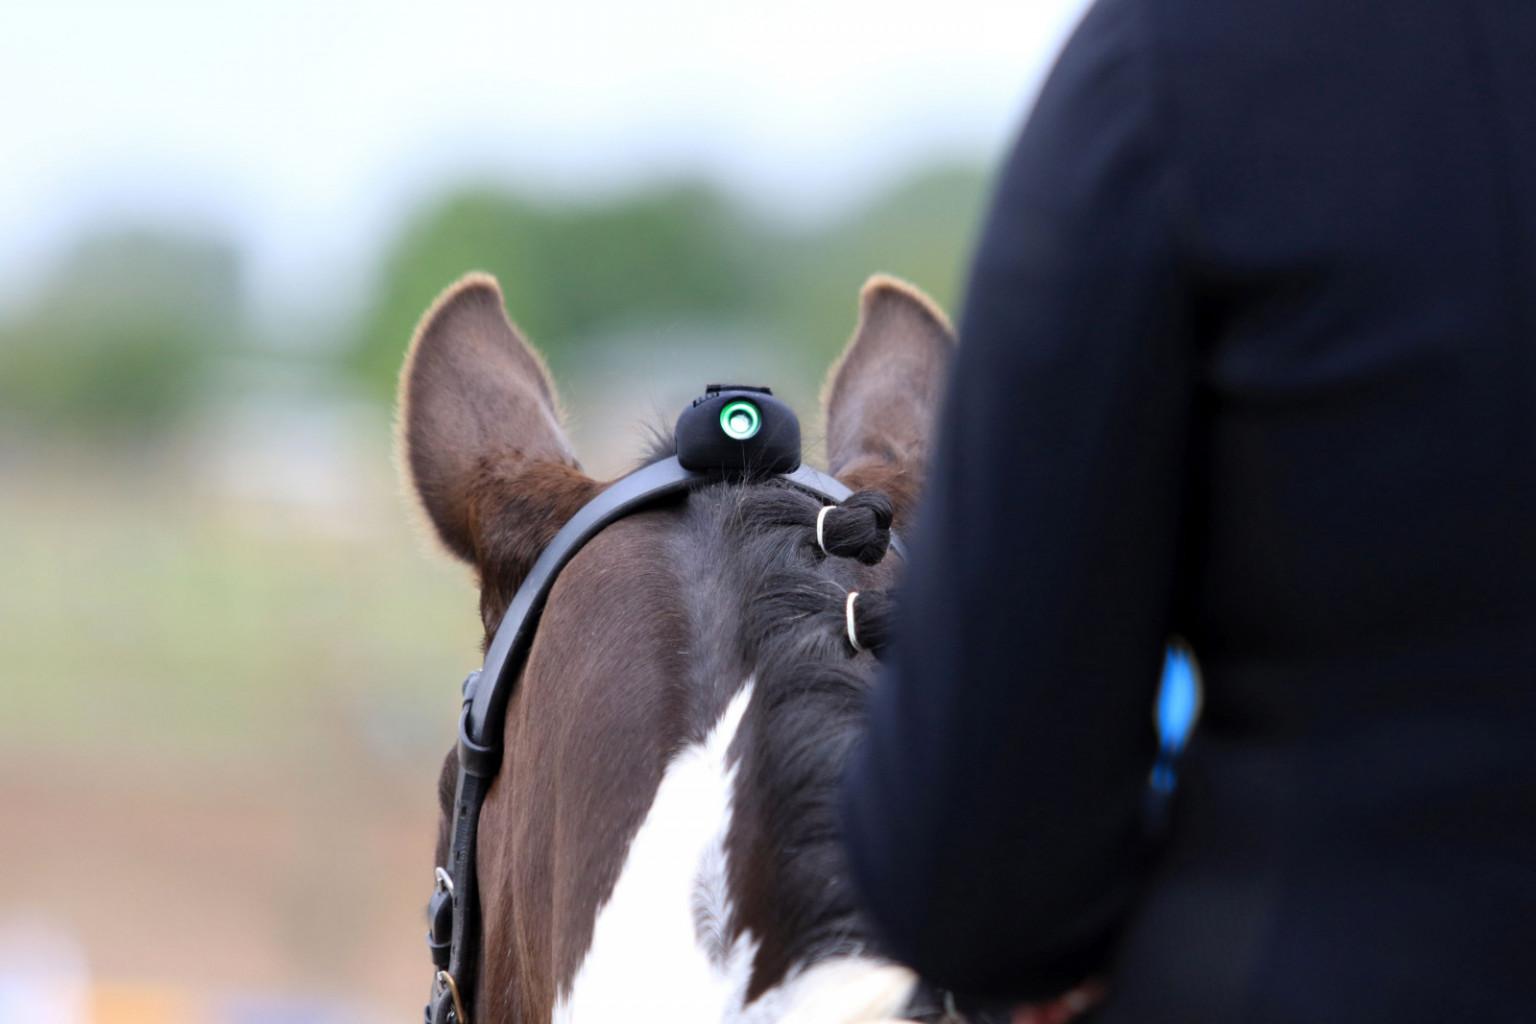 Zelena luč na napravi pomeni, da je konjeva glava pred oziroma na vertikali.